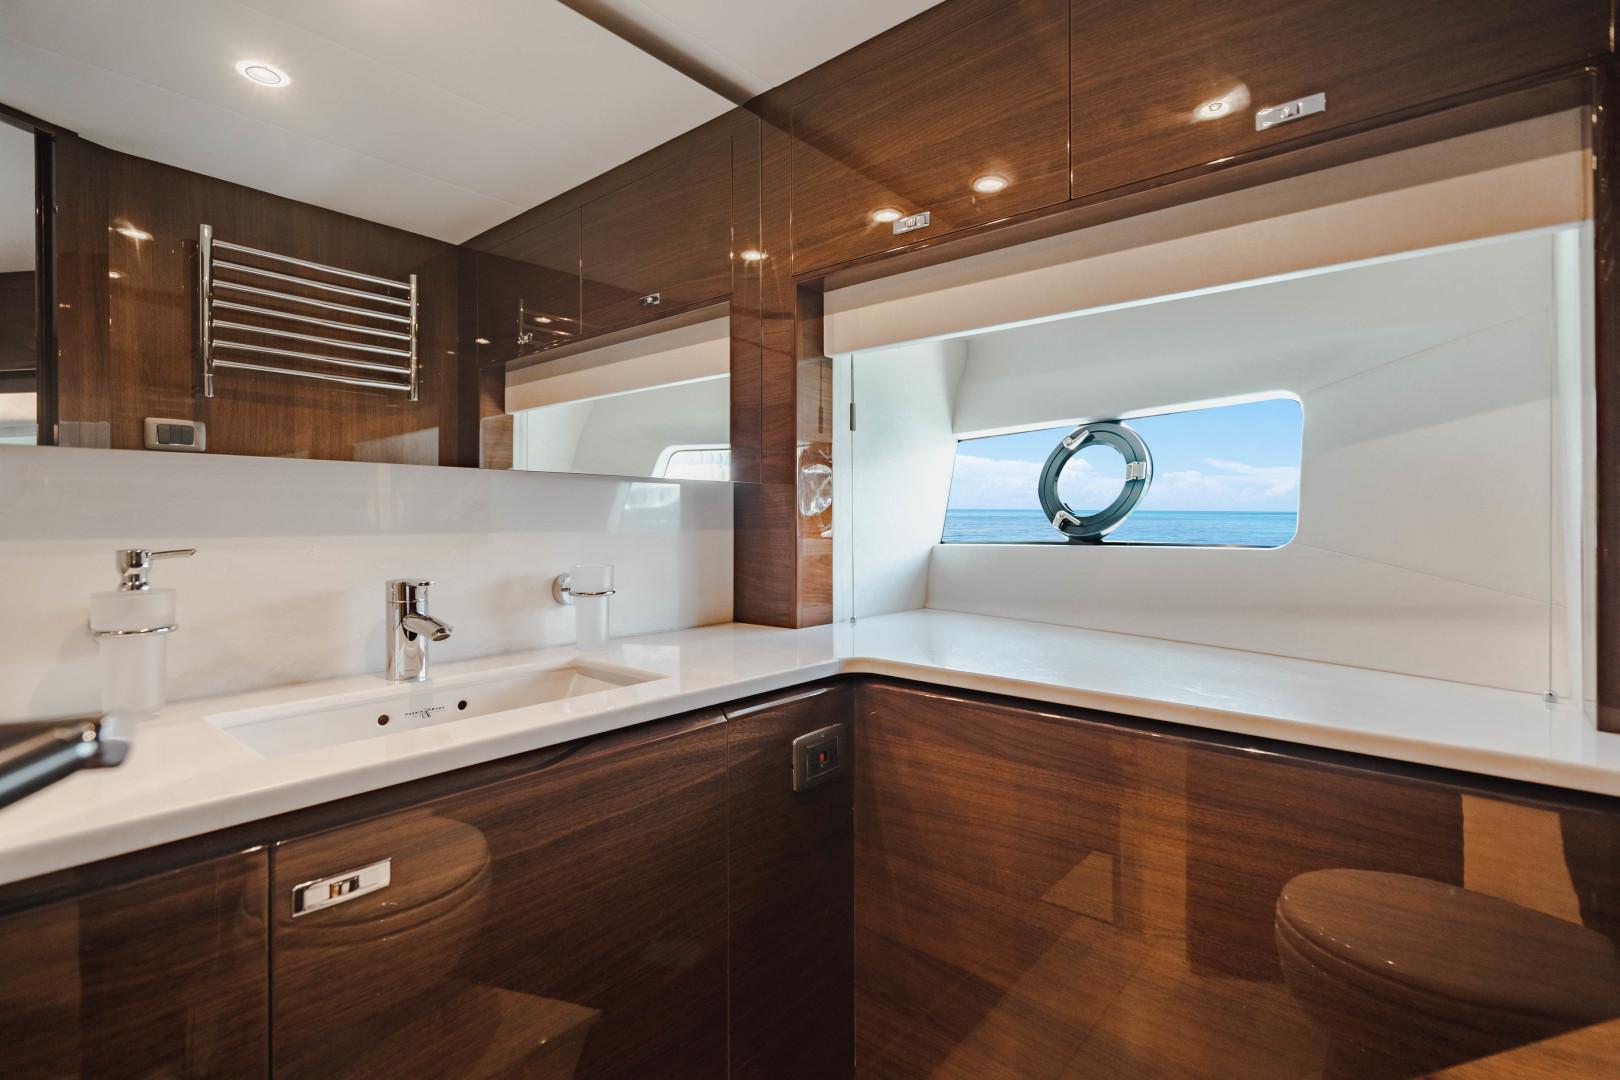 Princess-Y85  2019-Splash Delray Beach-Florida-United States-1631694 | Thumbnail